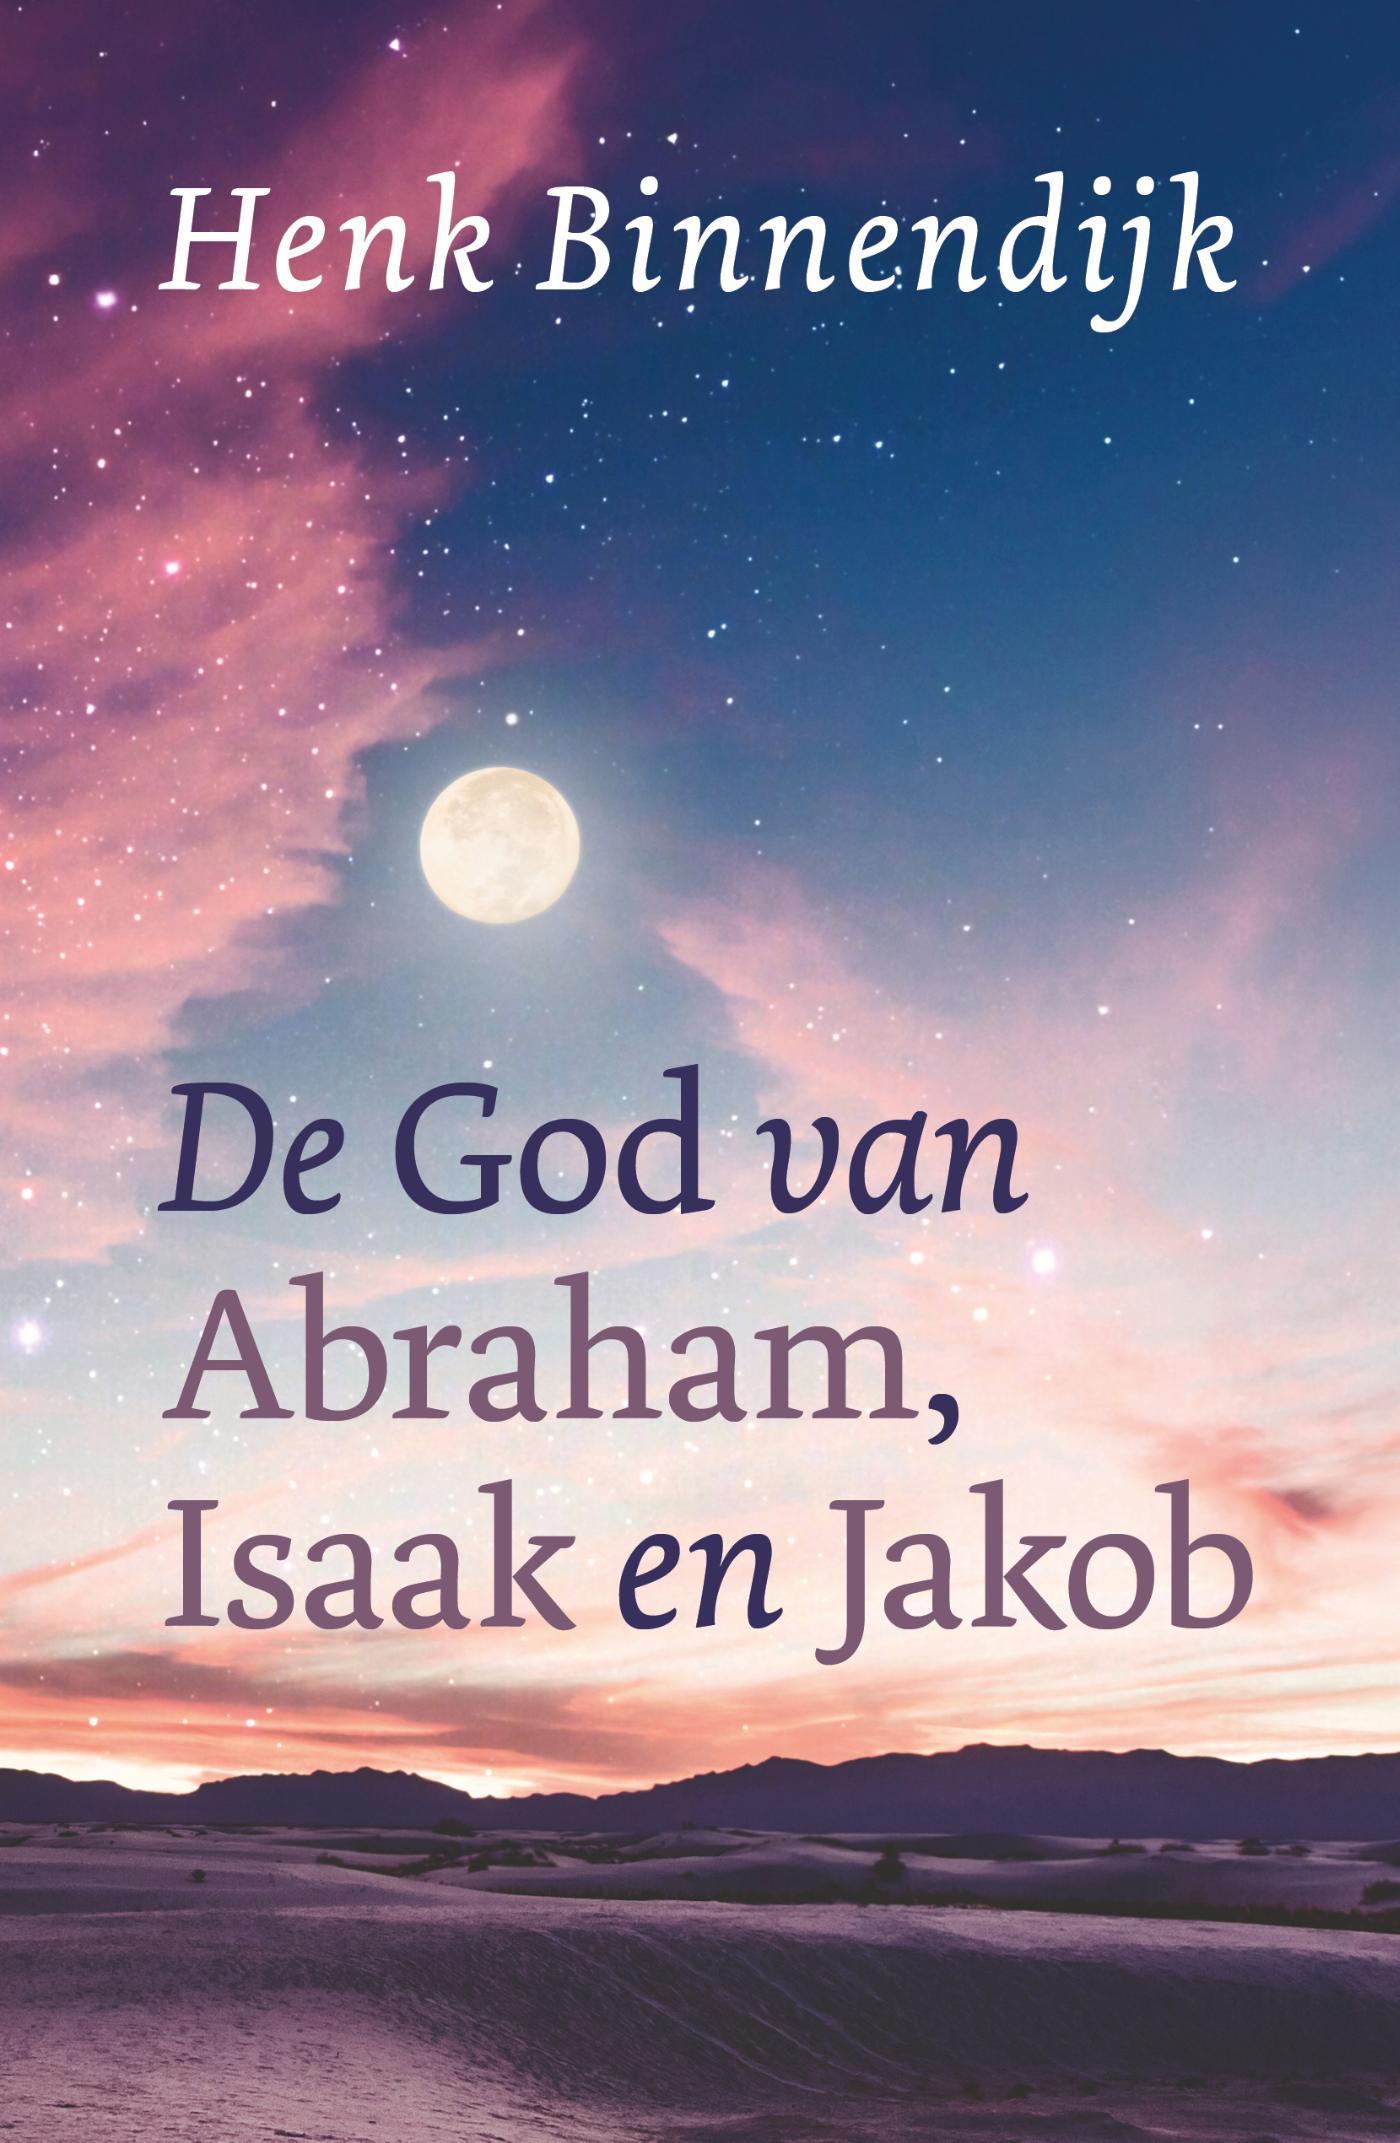 Abraham Isaak Jakob